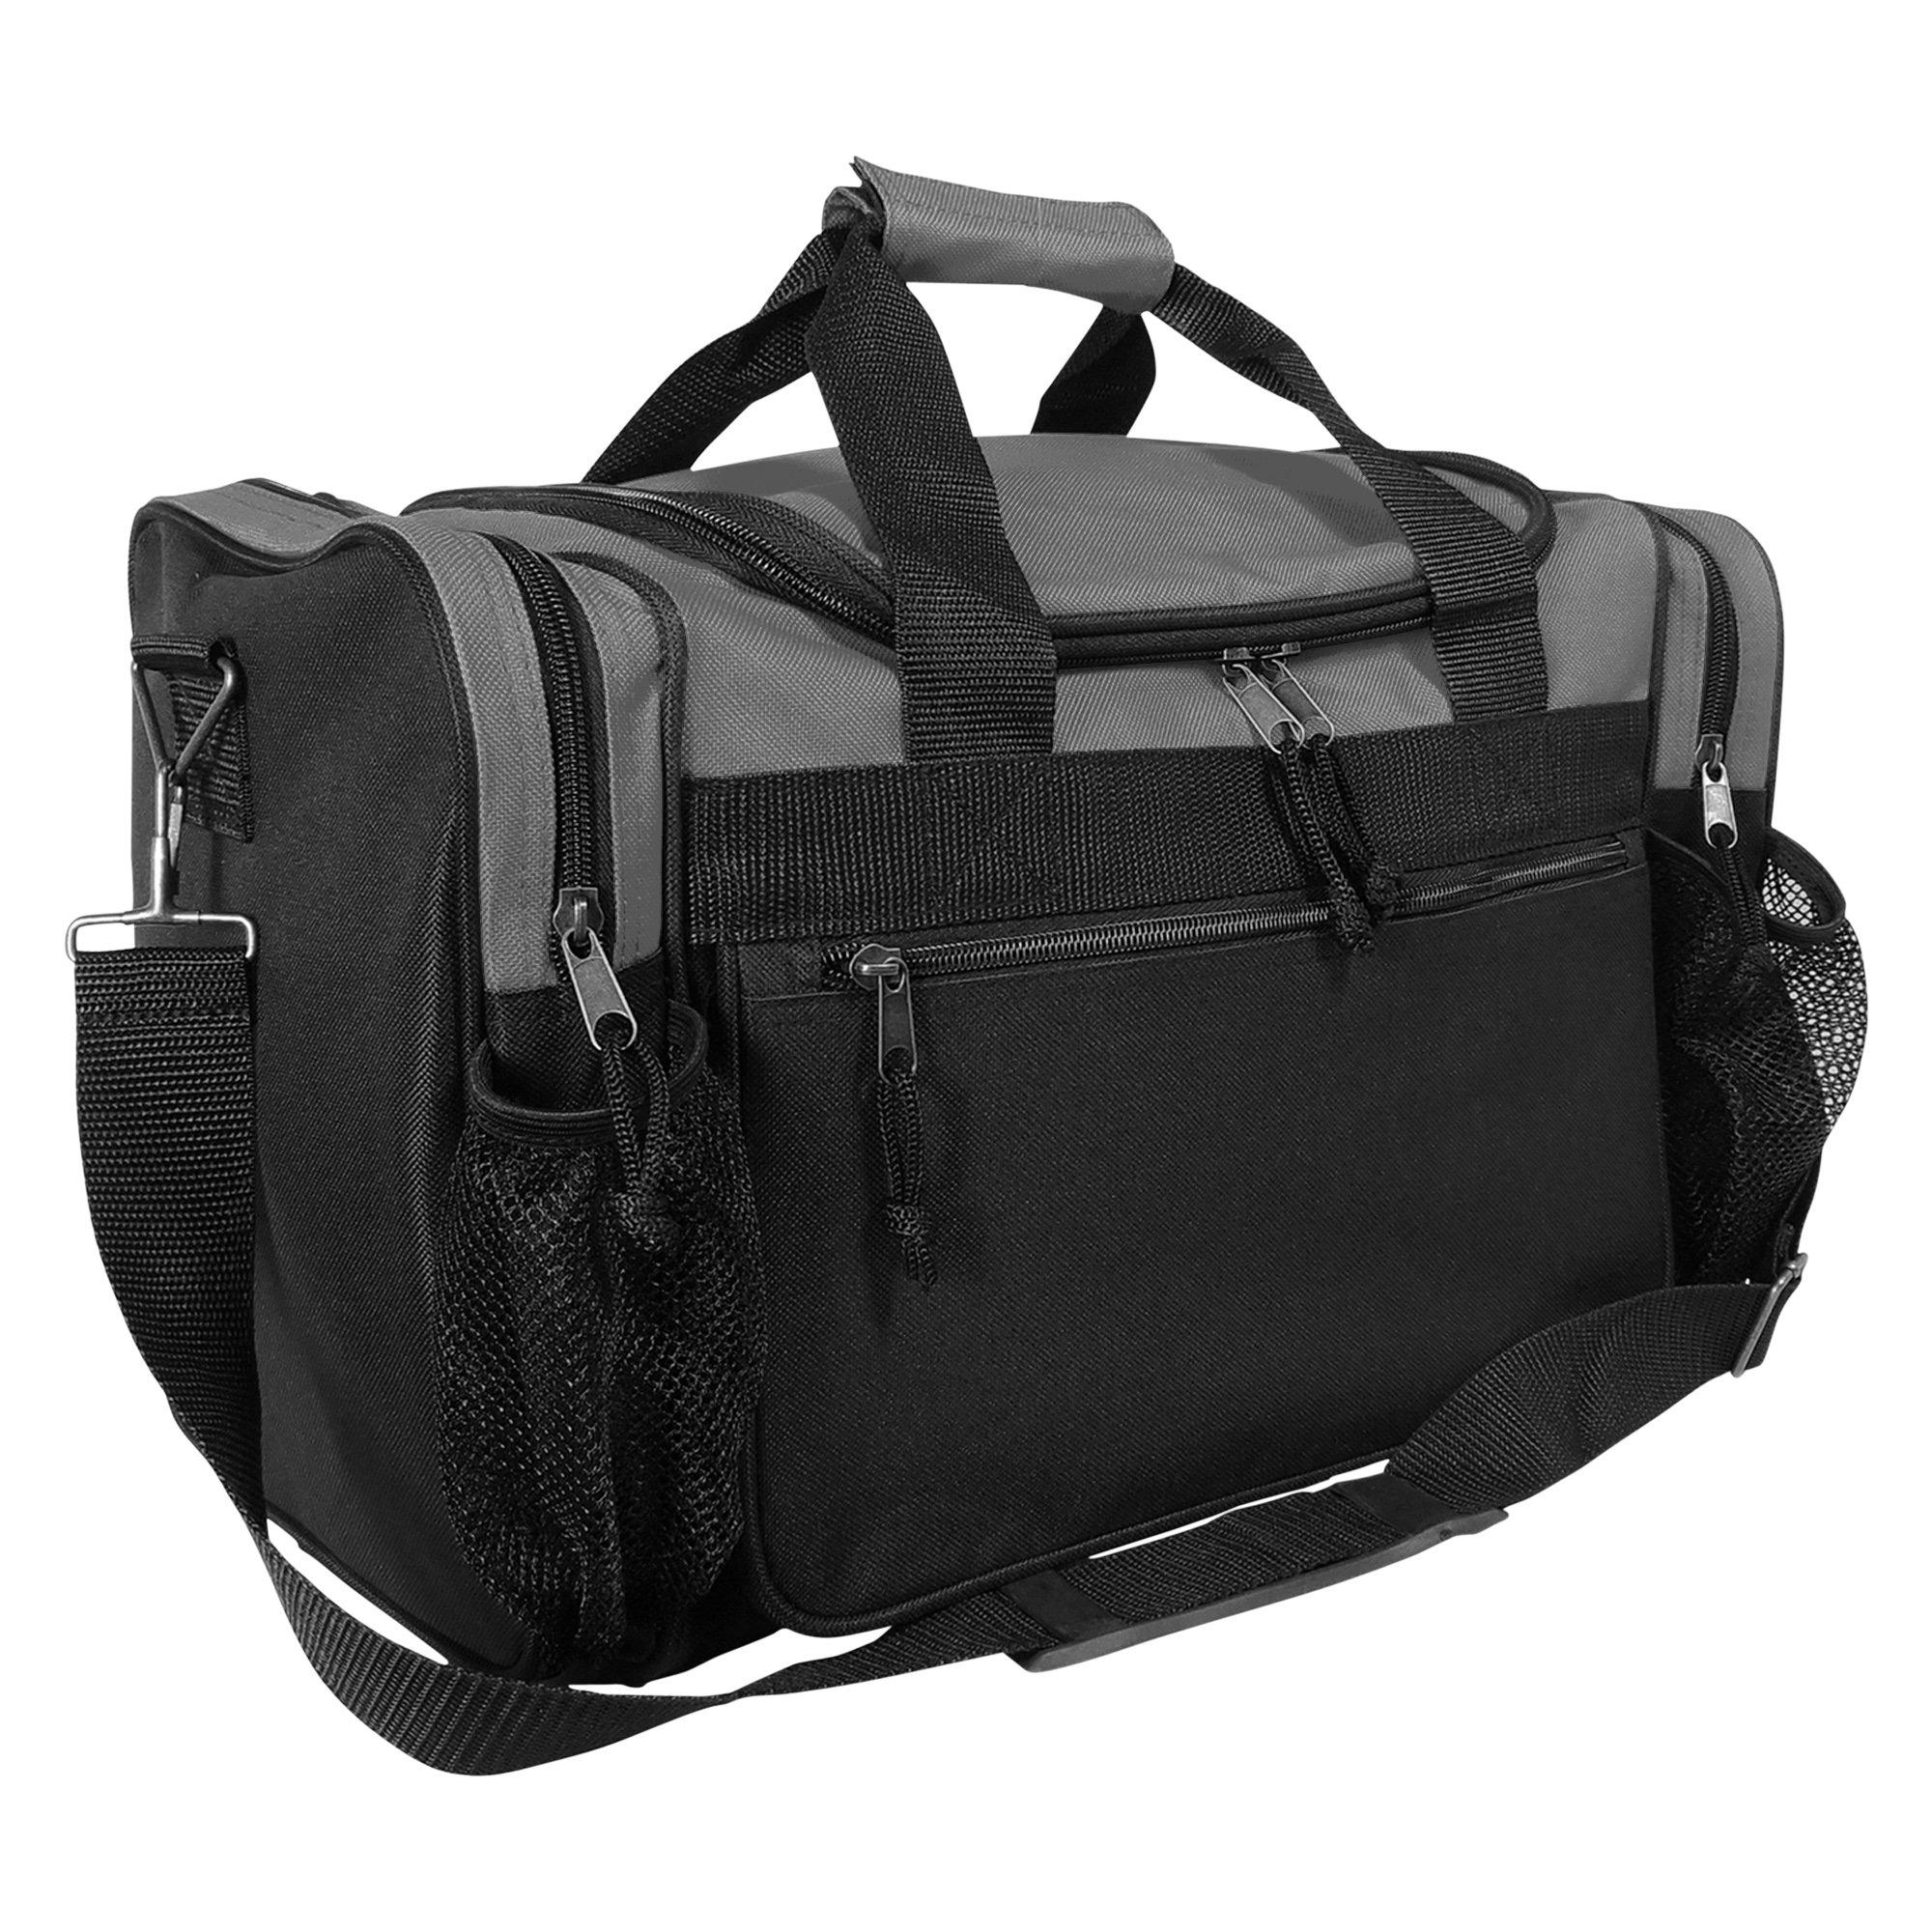 DALIX 17'' Duffle Bag Front Mesh Pockets in (Gray)